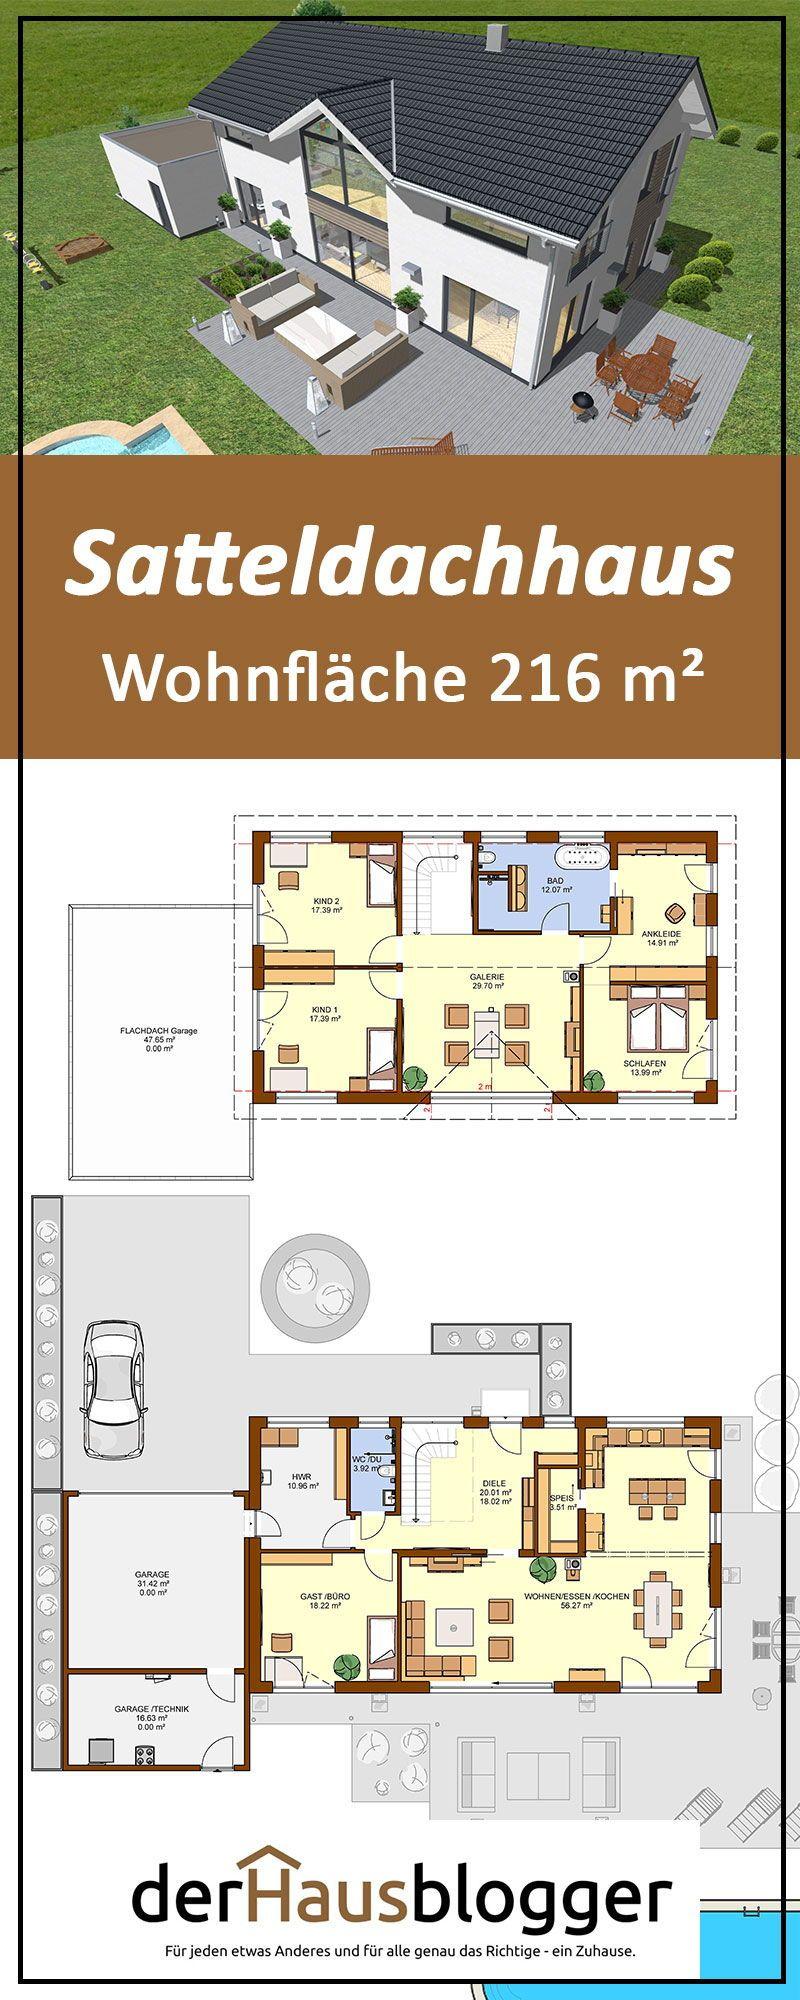 Photo of Satteldachhaus 216m² | derHausblogger